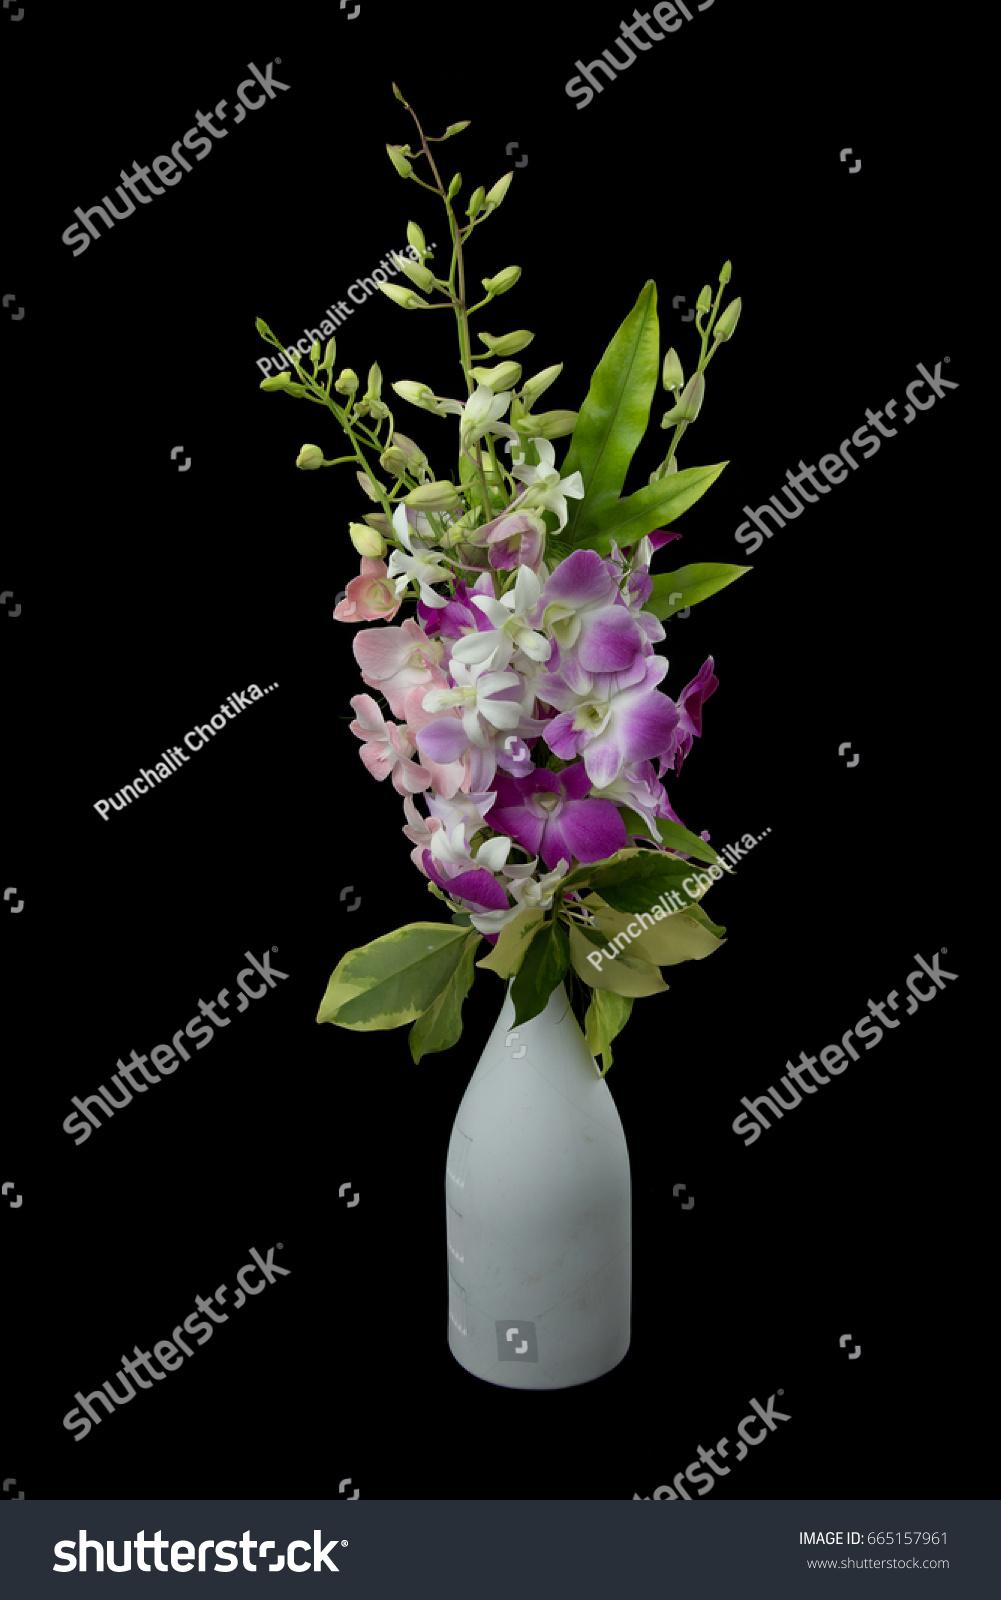 Assorted dendrobium orchid flower bouquet brunch stock photo edit assorted dendrobium orchid flower bouquet brunch in a vase on black background izmirmasajfo